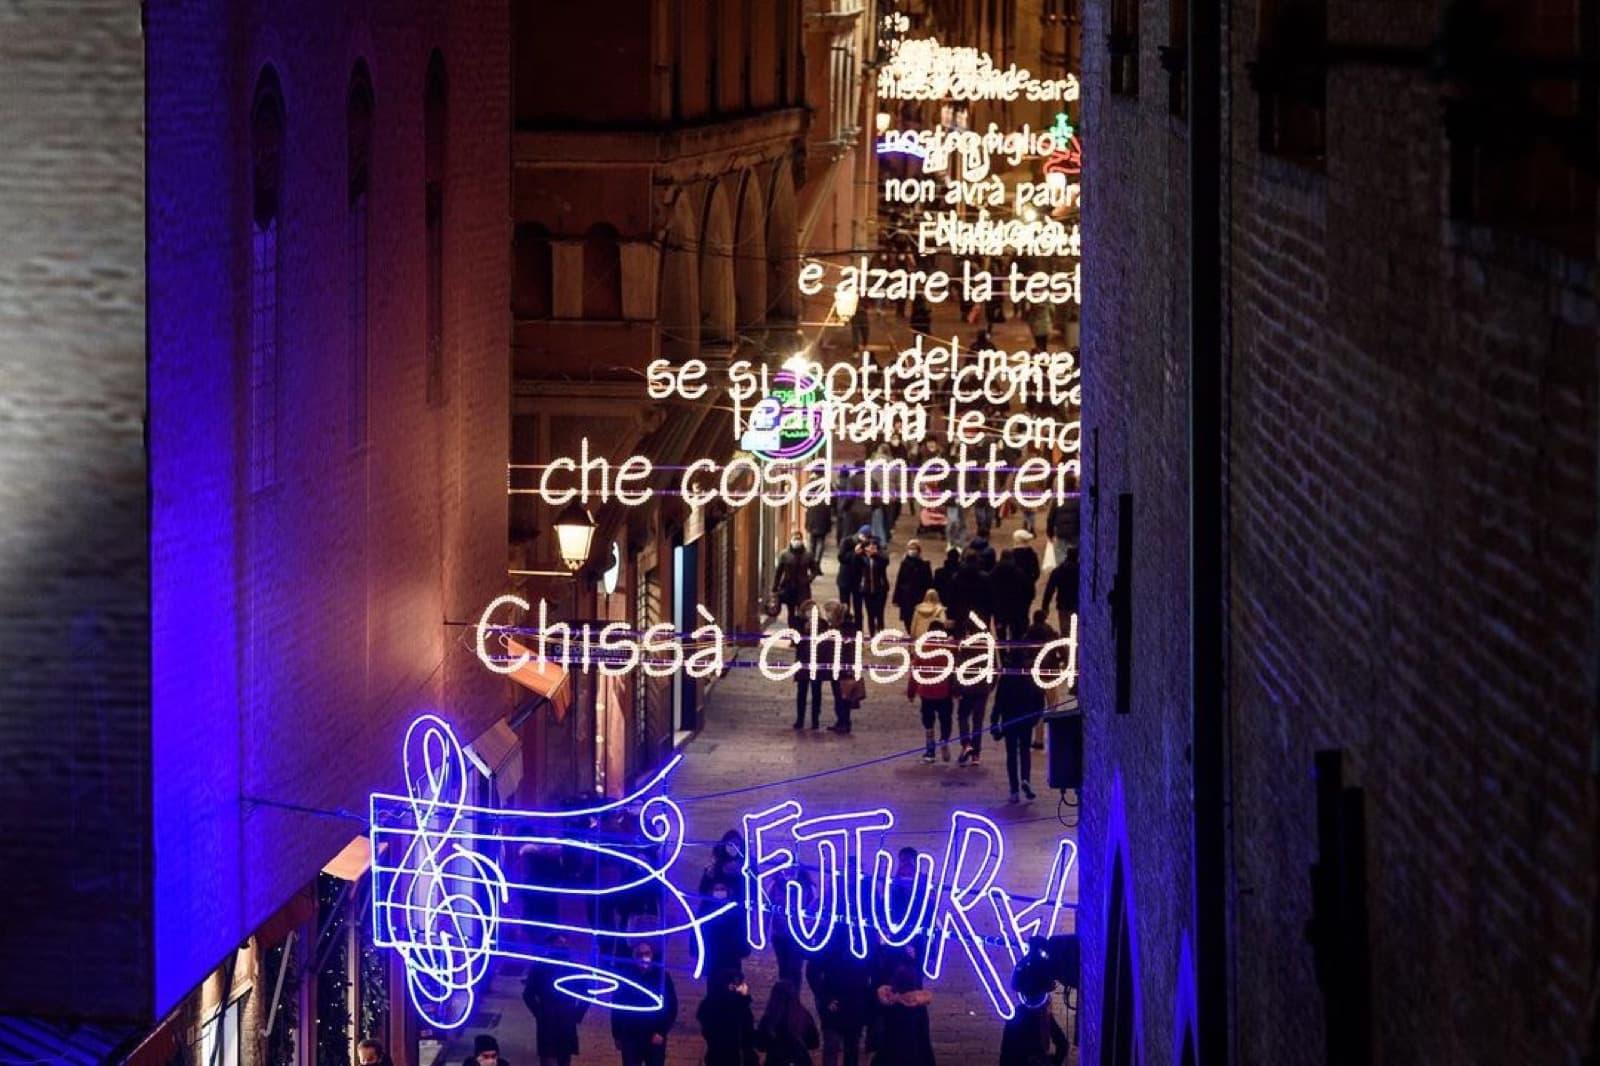 Parole di Natale in Emilia-Romagna